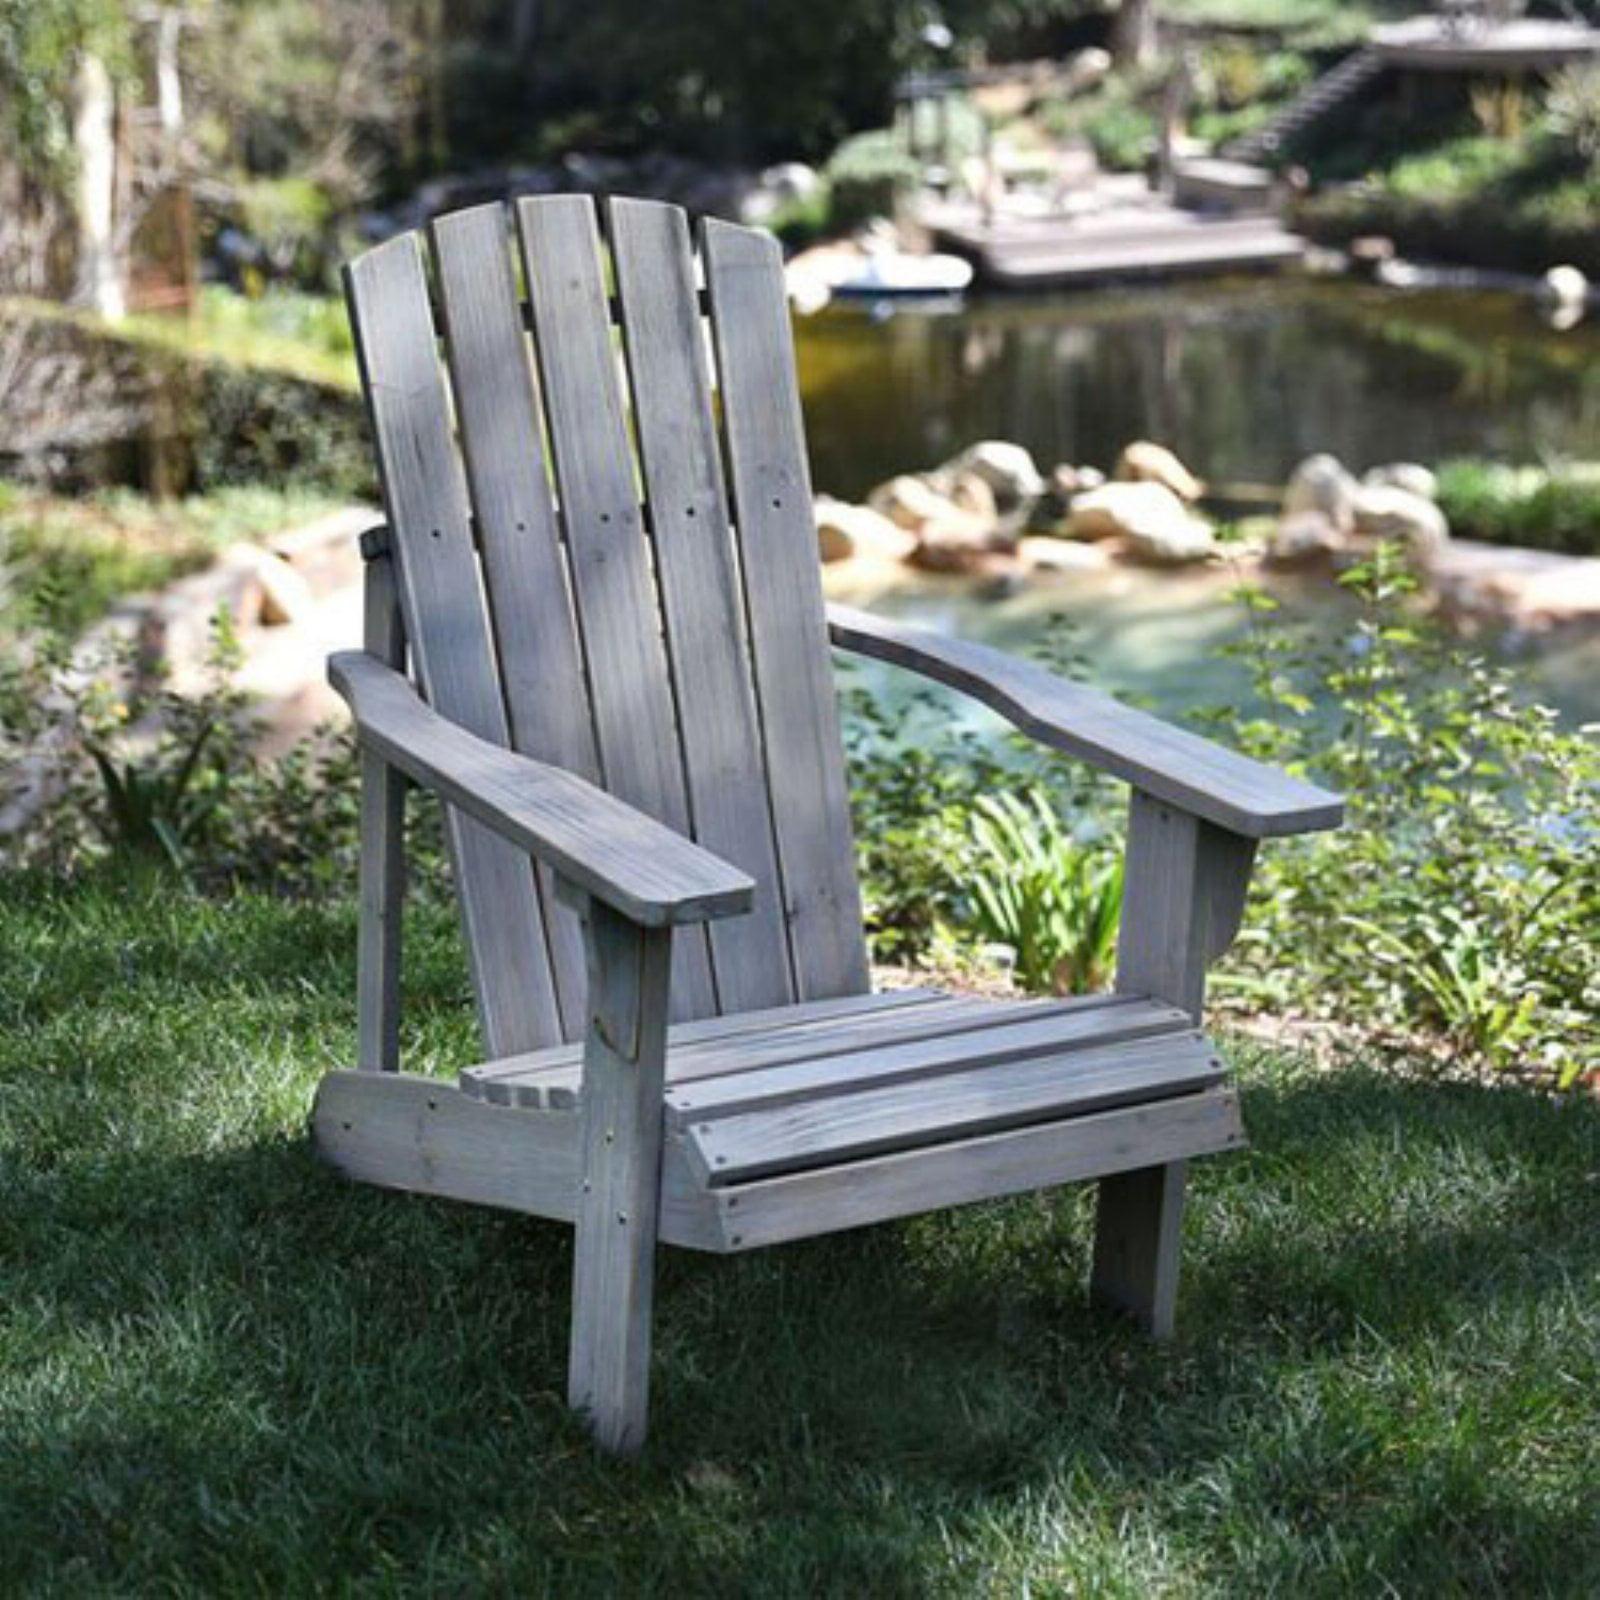 Lakewood Rustic Adirondack Chair Vintage Gray by Shine Company